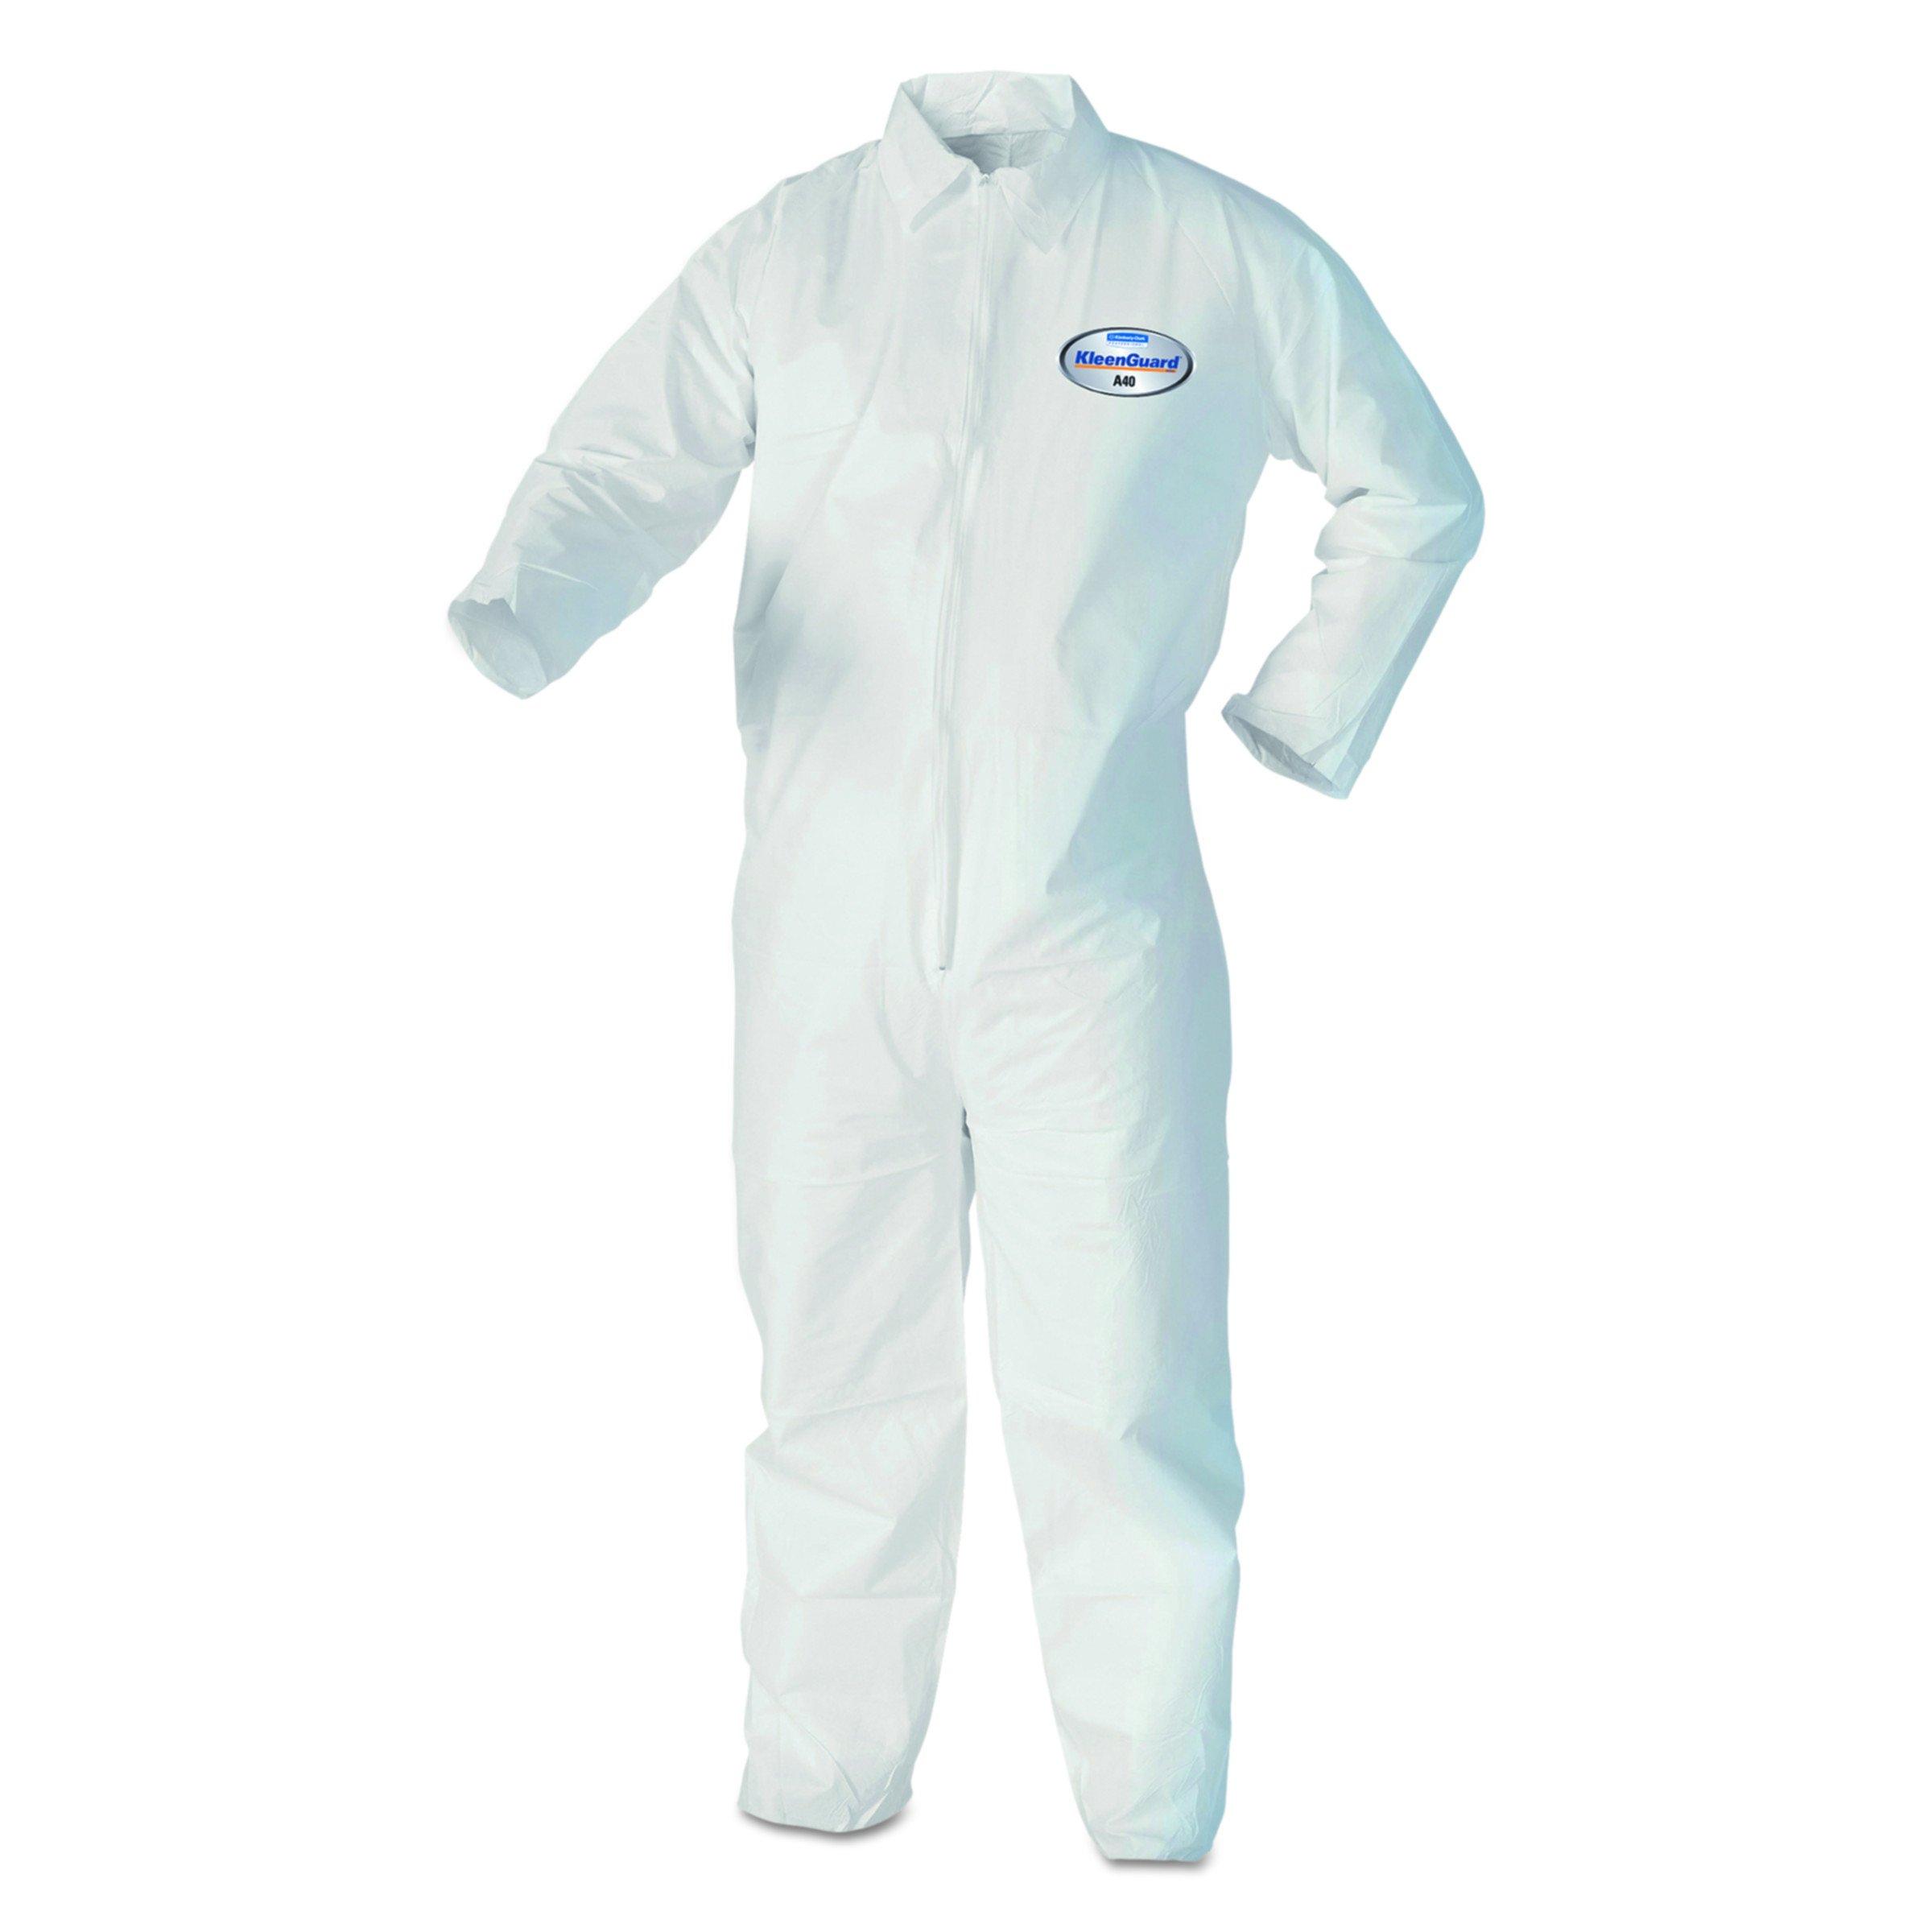 Kleenguard A40 Liquid & Particle Protection  Coveralls (44302), Zipper Front, White, Medium, 25 Garments / Case